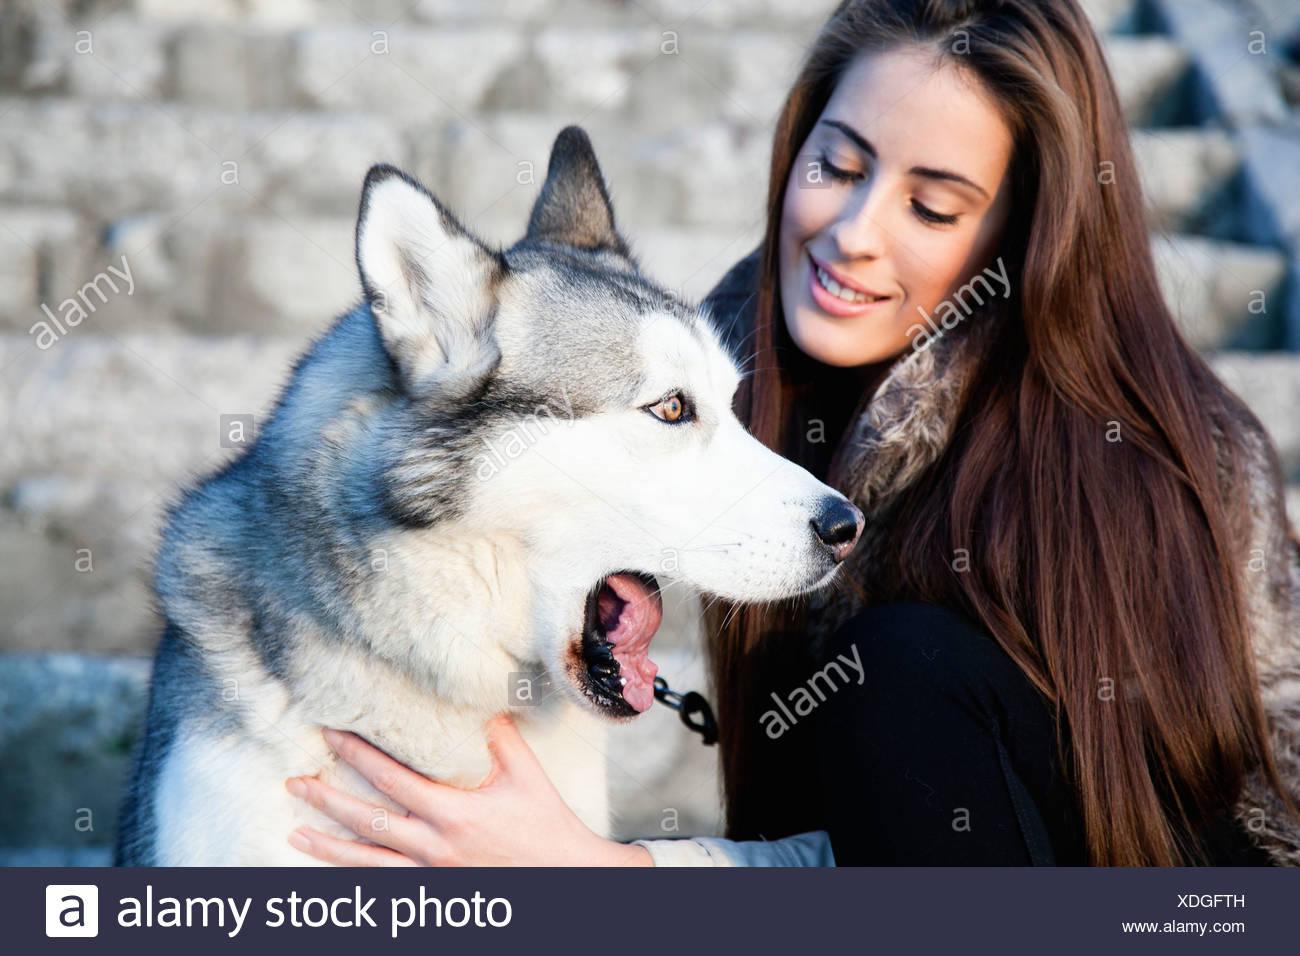 Woman with Dog Outdoors, Croatia - Stock Image